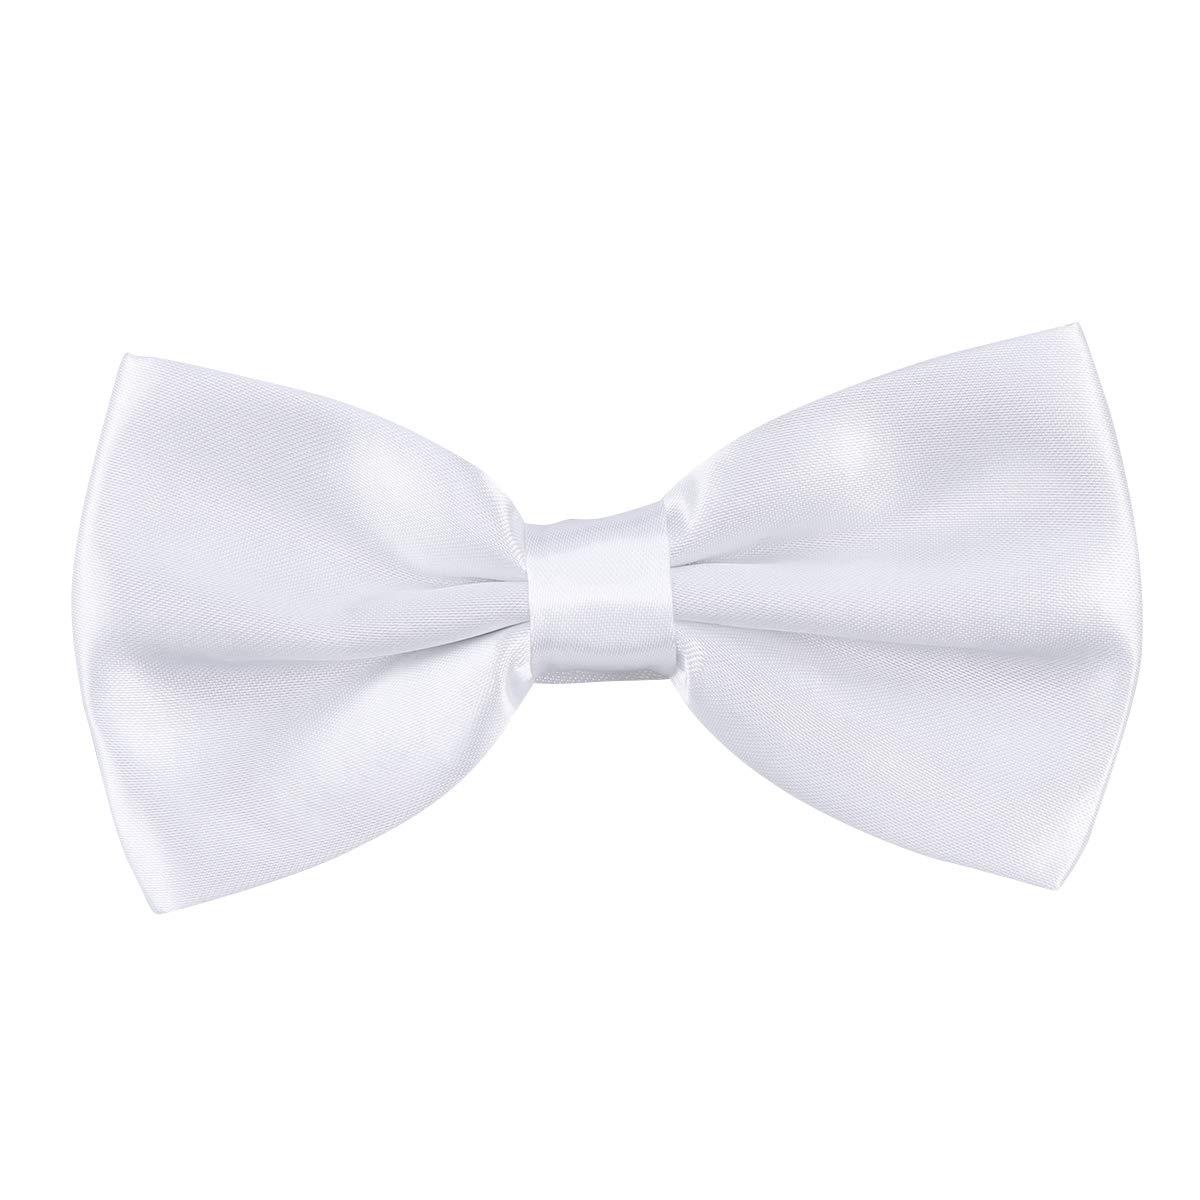 Slim bow tie custom bow tie-bow ties-wedding bowtie Skinny bow tie wedding ties-groom/'s bowtie-black bowtie-black satin bowtie-custom tie